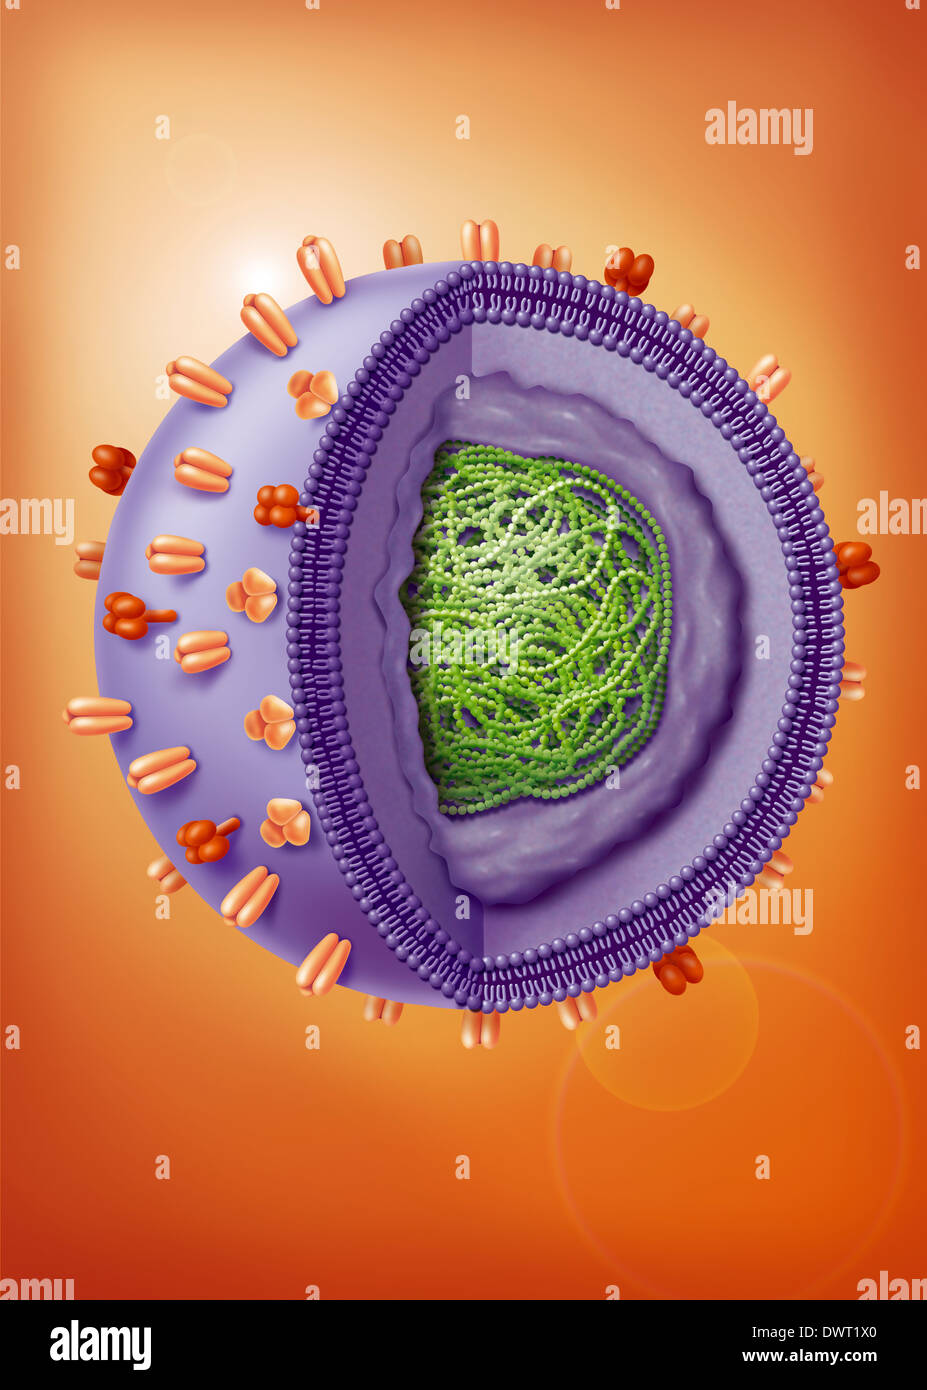 Influenza virus, drawing - Stock Image